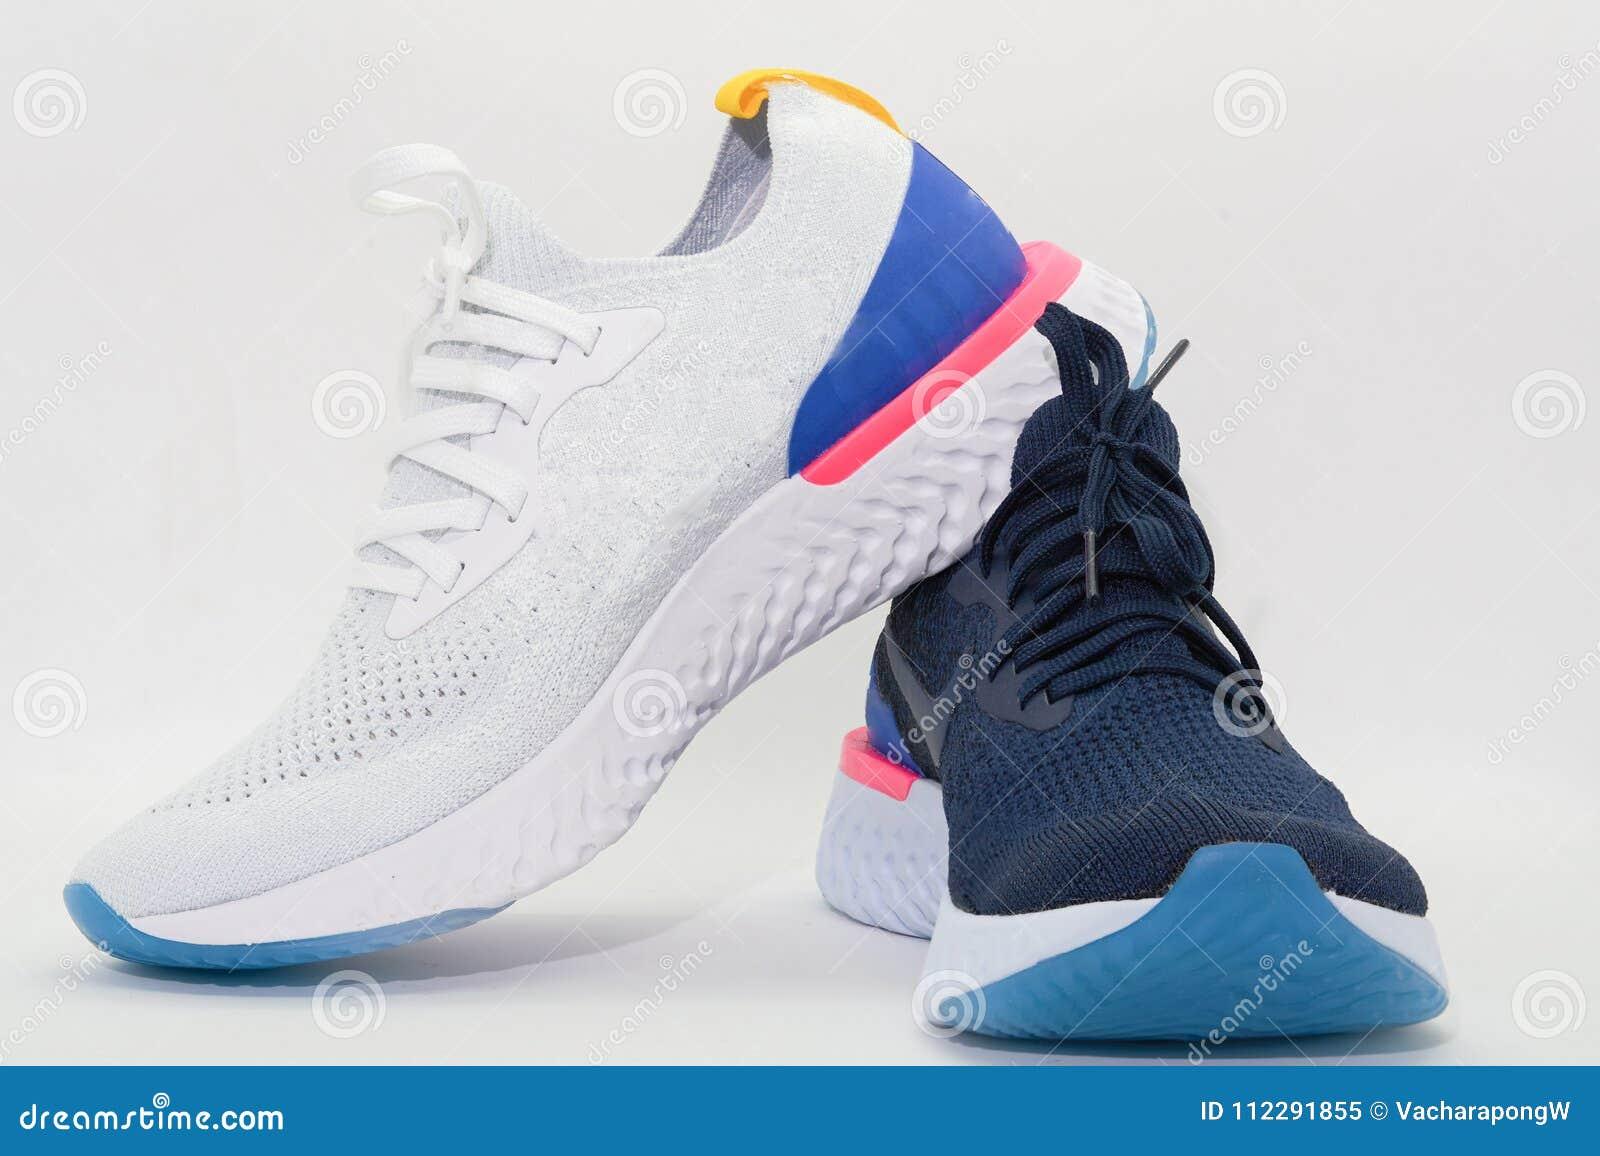 7ea90ca51f Αθλητικά παπούτσια για το τρέξιμο